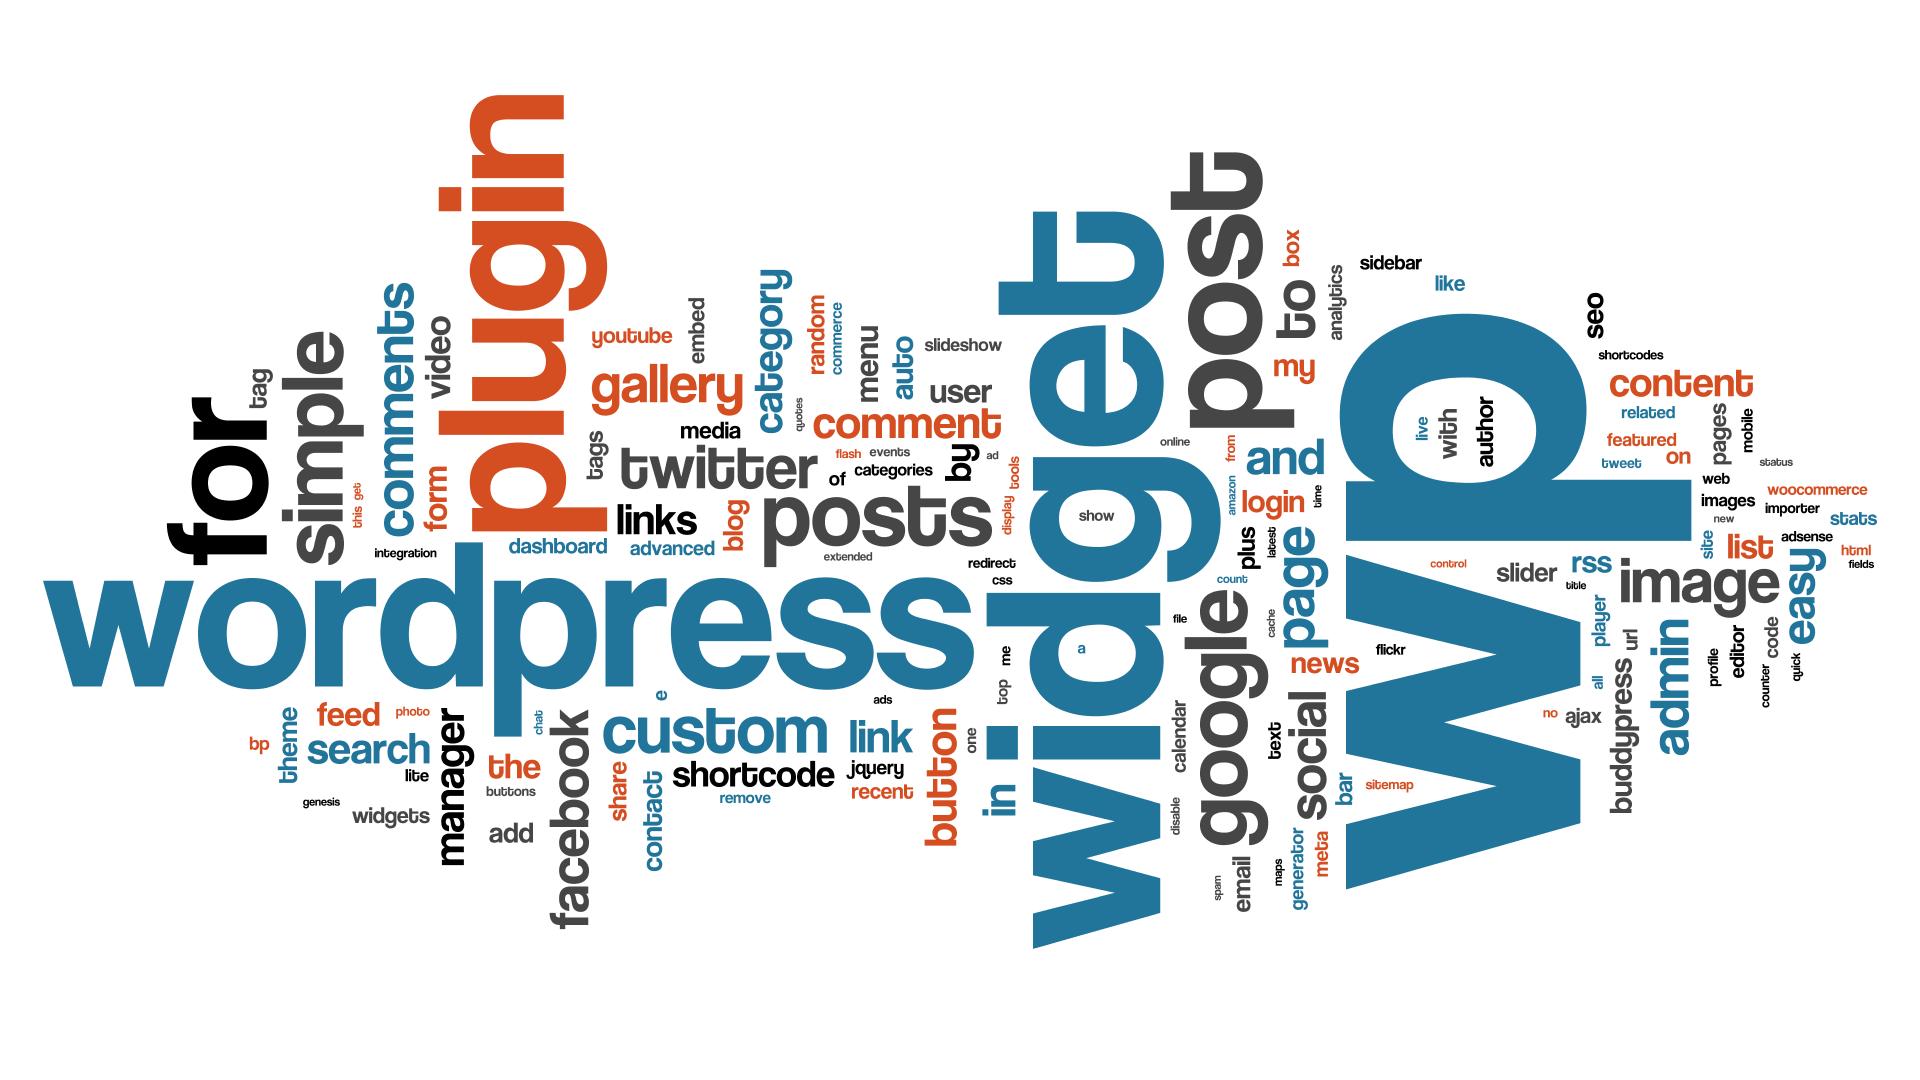 Wordpress-Wordel